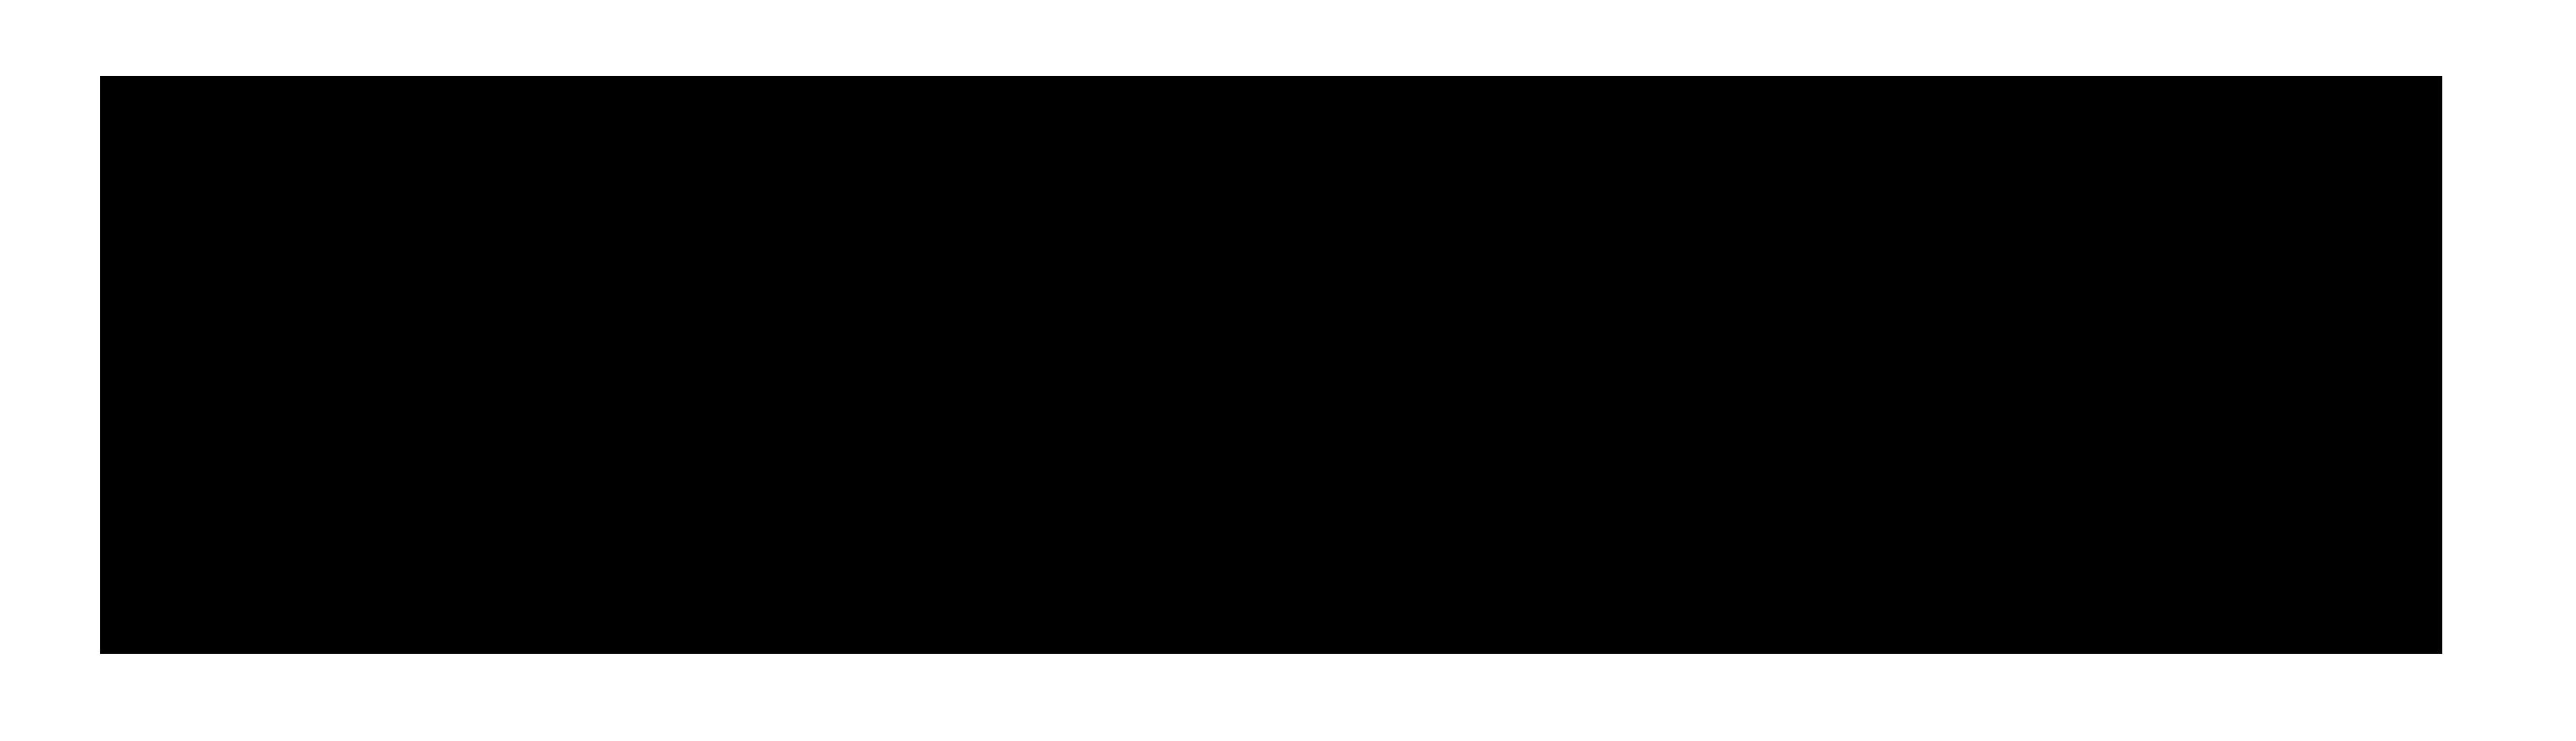 kohlruss-fotografie